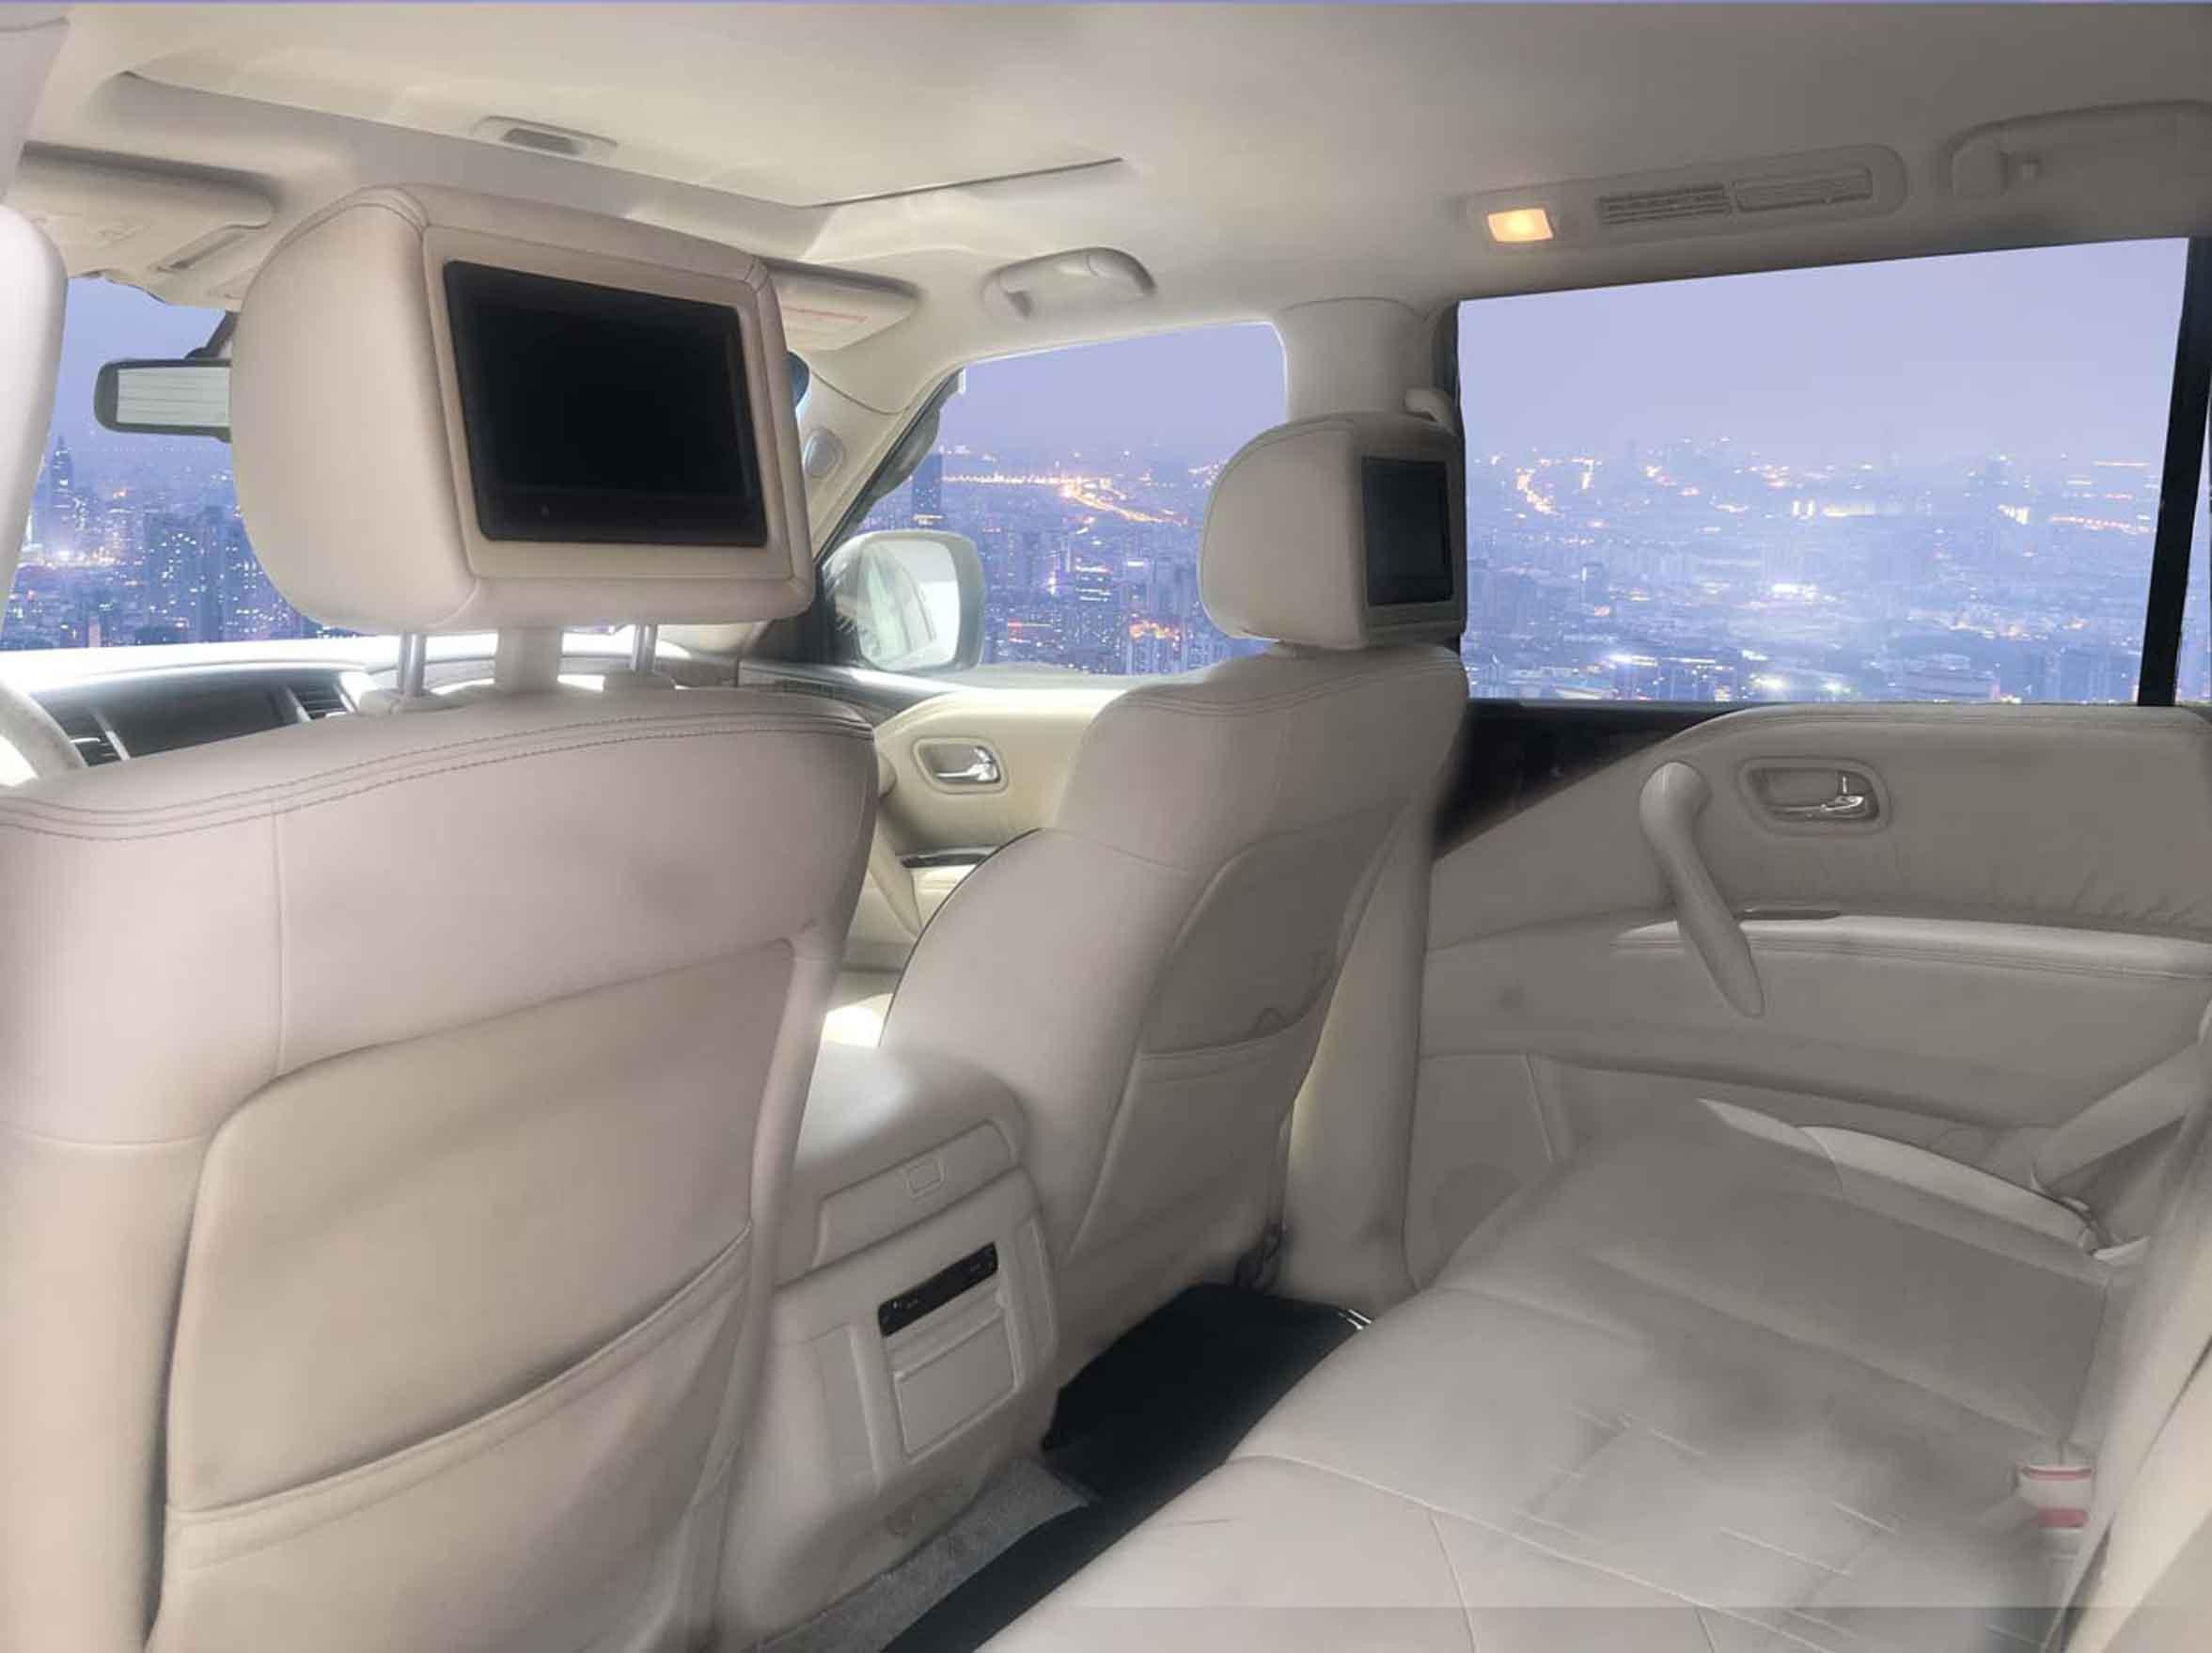 stallion approved - nissan PATROL 2010 01 interior 2